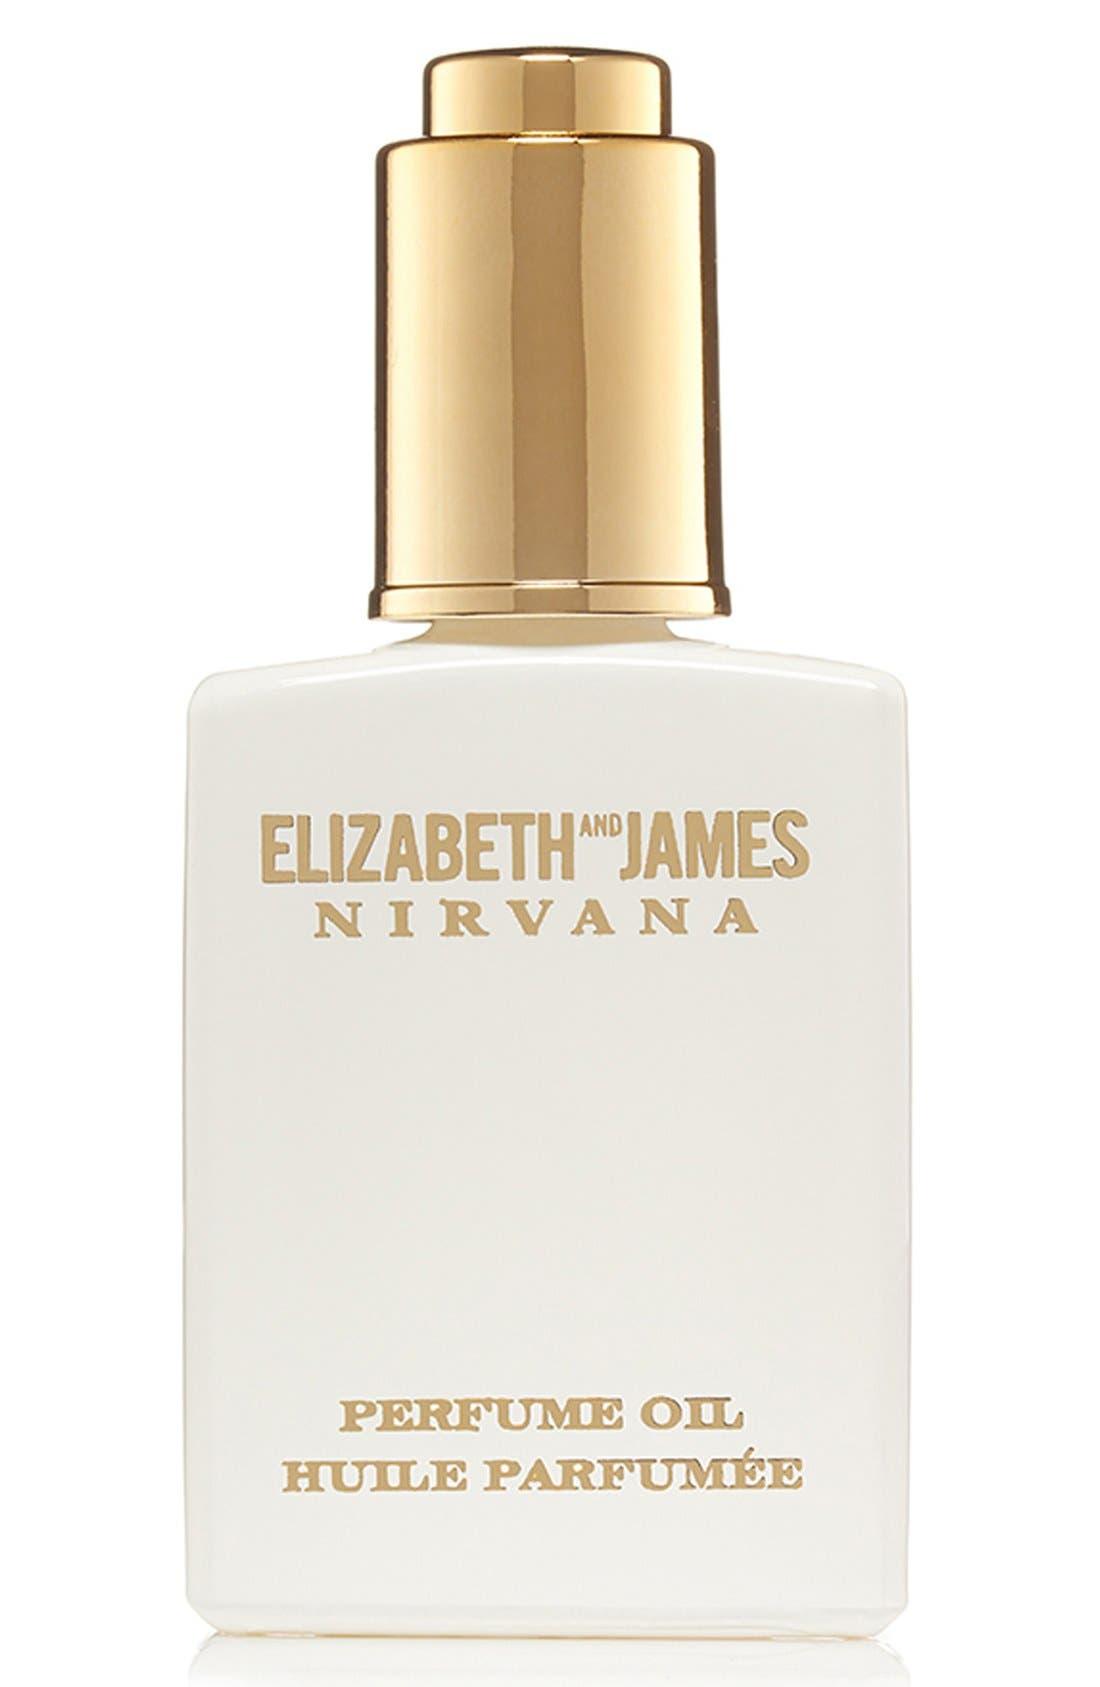 Elizabeth and James 'Nirvana White' Perfume Oil